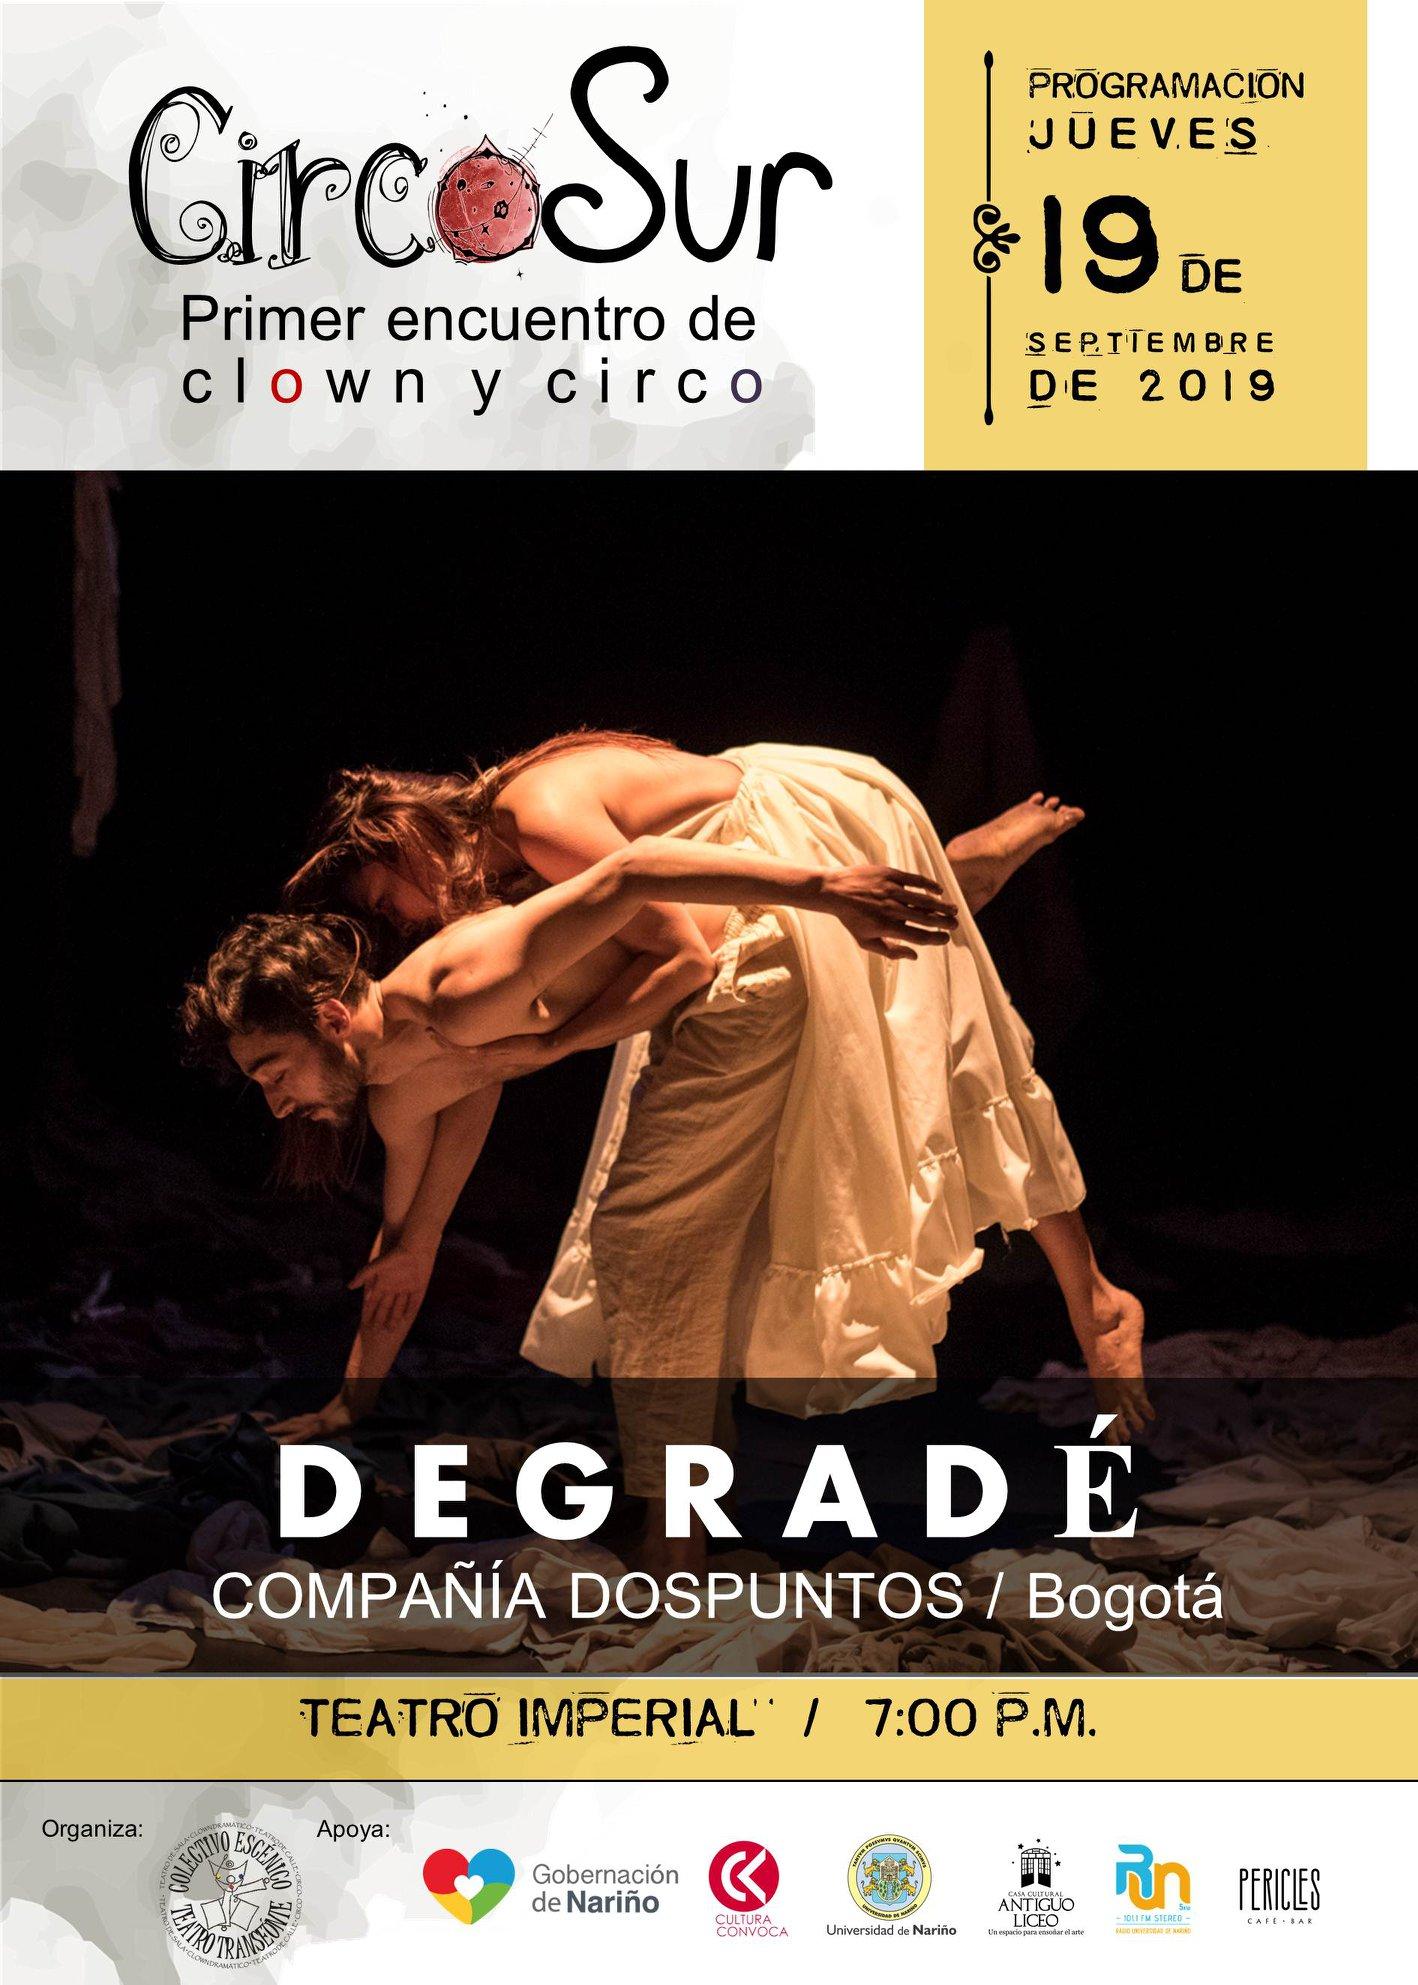 Encuentro Circo sur, Pasto (2019)